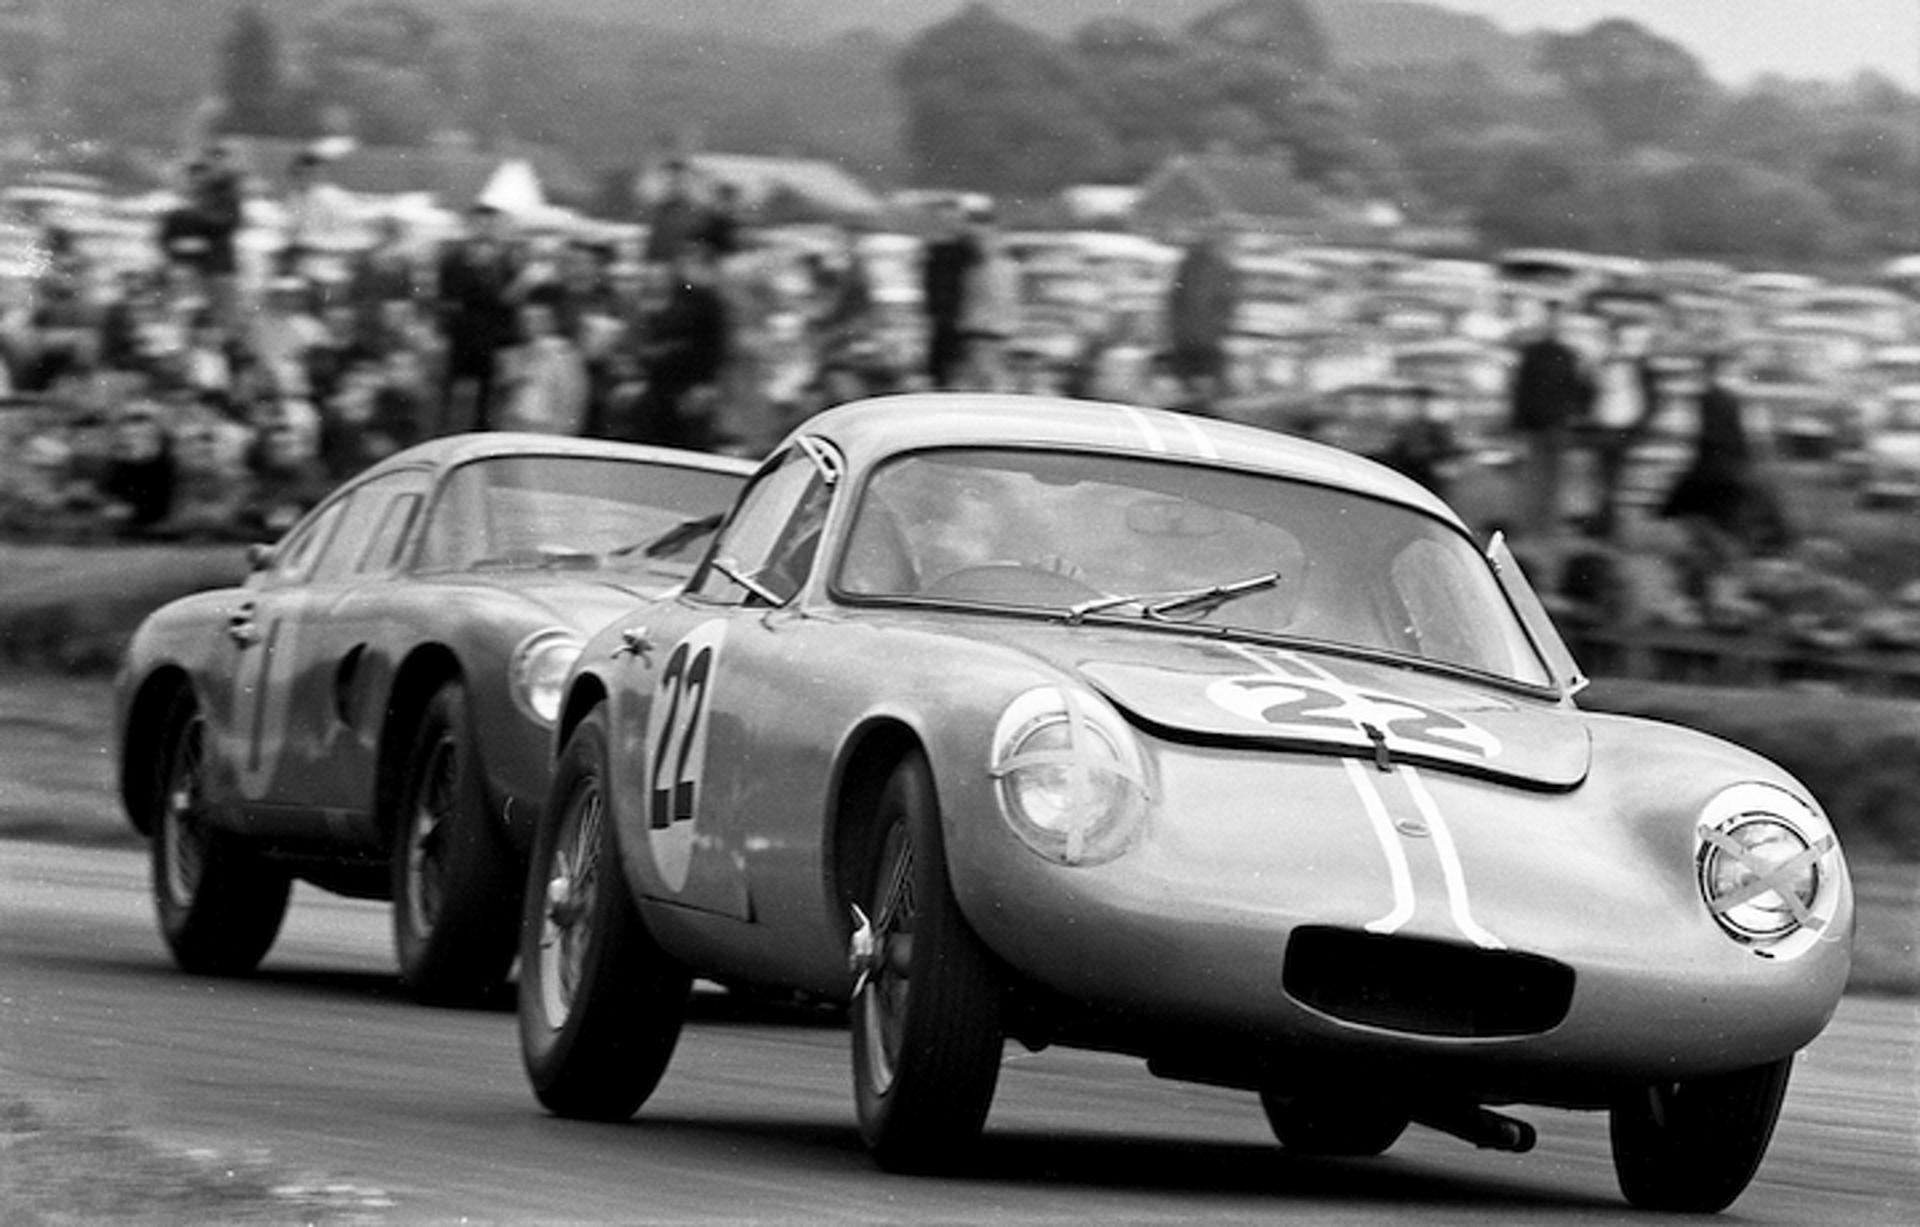 Minty Fresh 1958 Lotus Elite Series 1 Headed To Auction